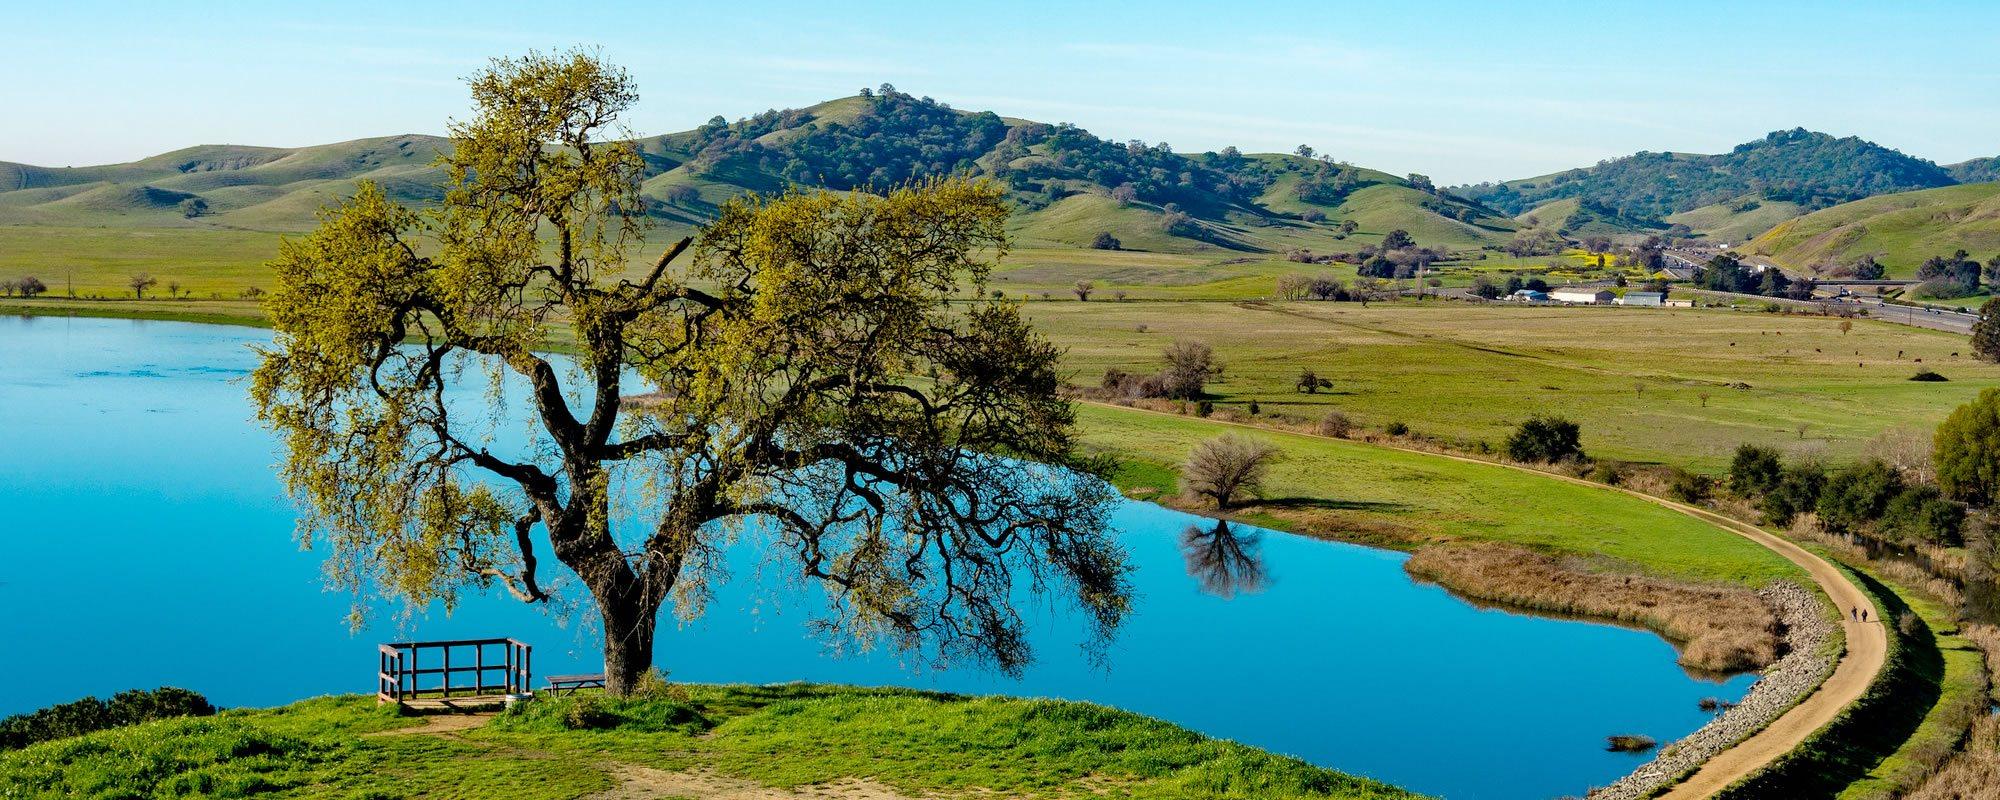 vacaville-california.jpg